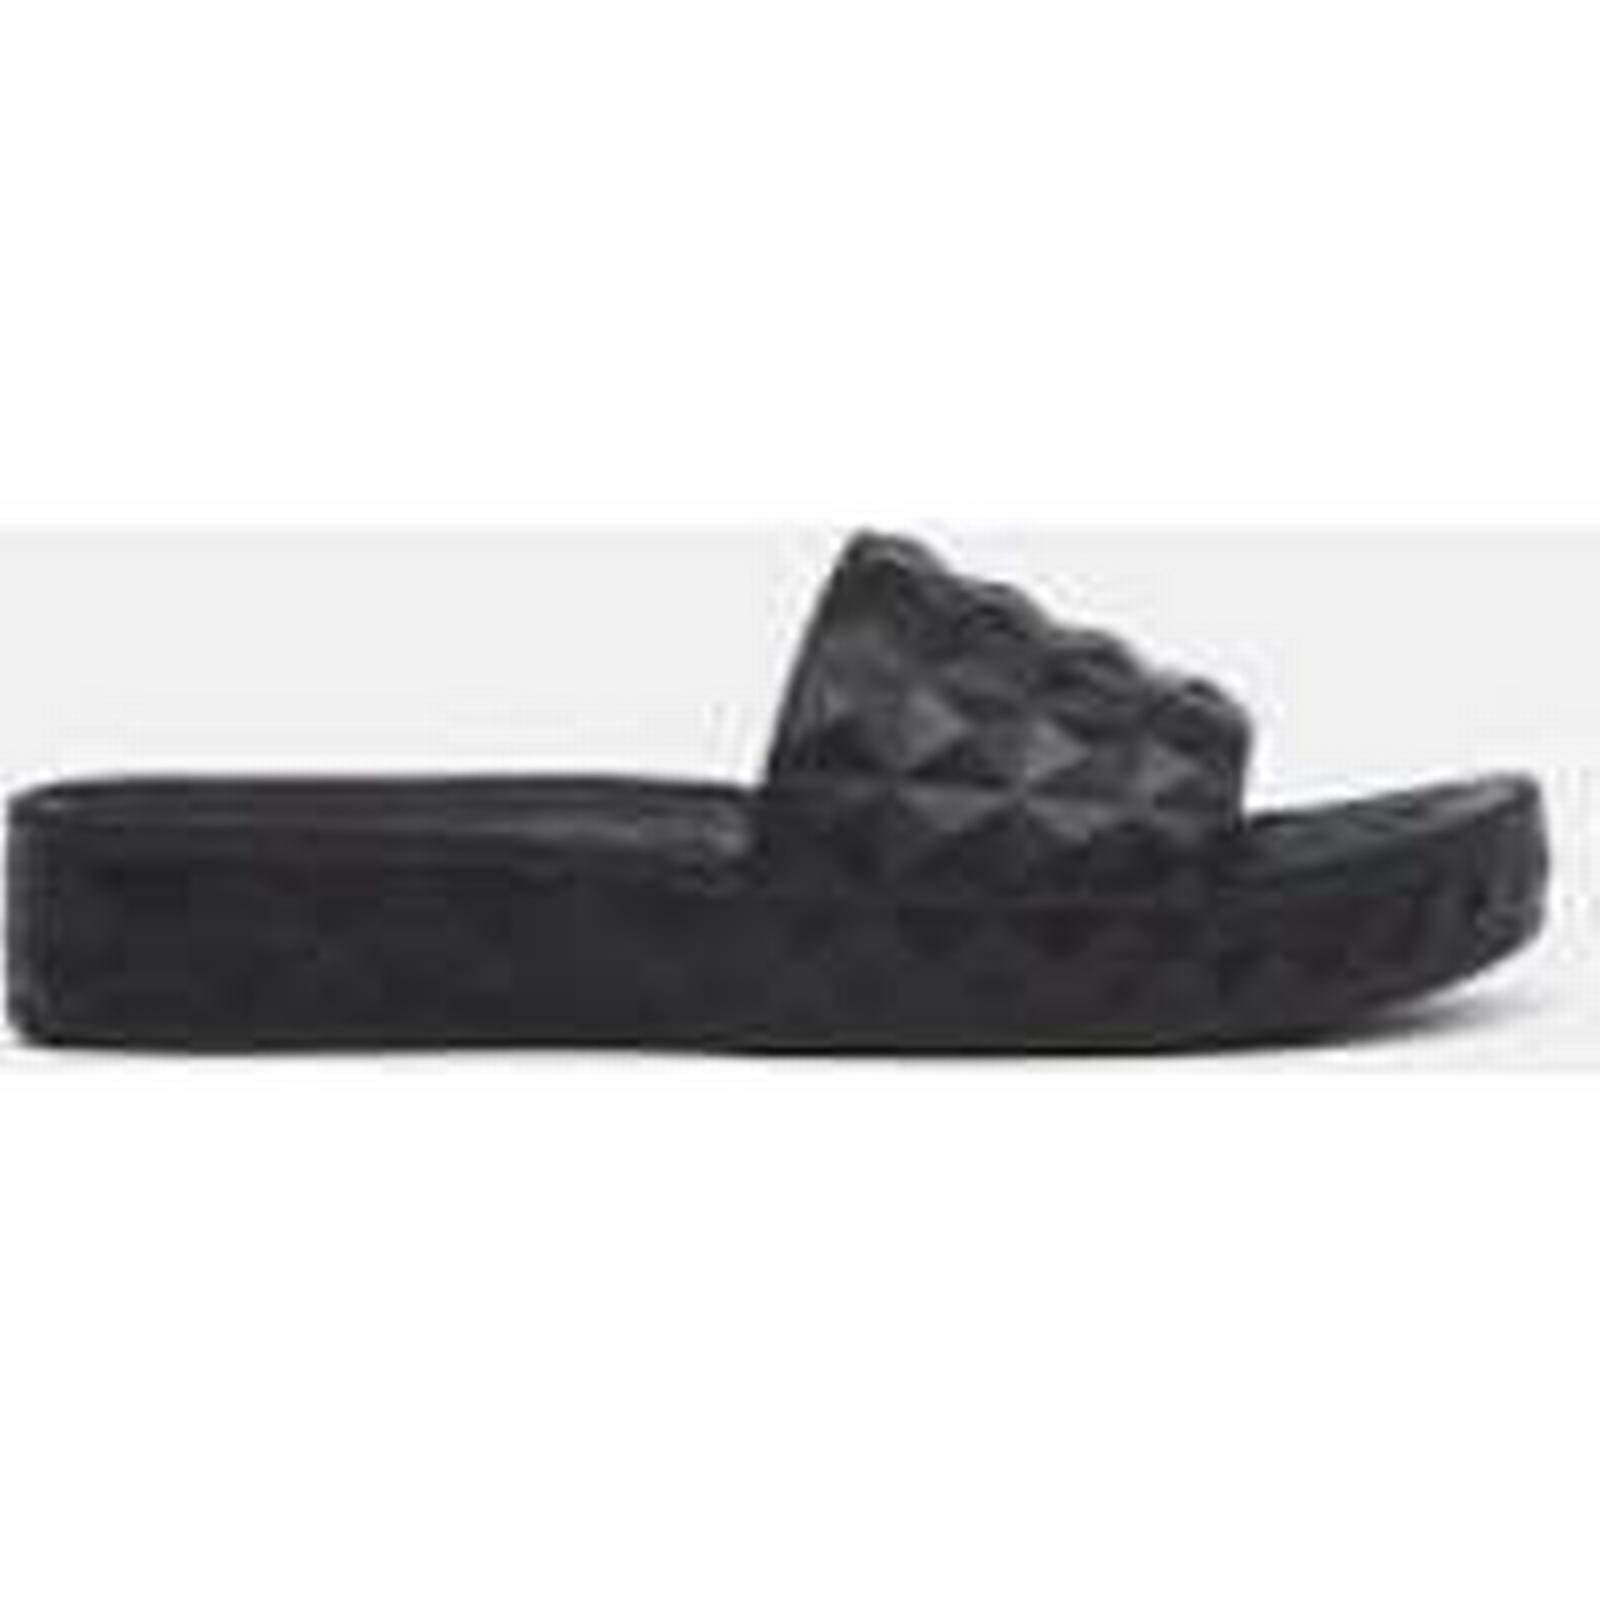 Ash Women's Splash 6 Slide Sandals - Black - UK 6 Splash - Black dc78d3